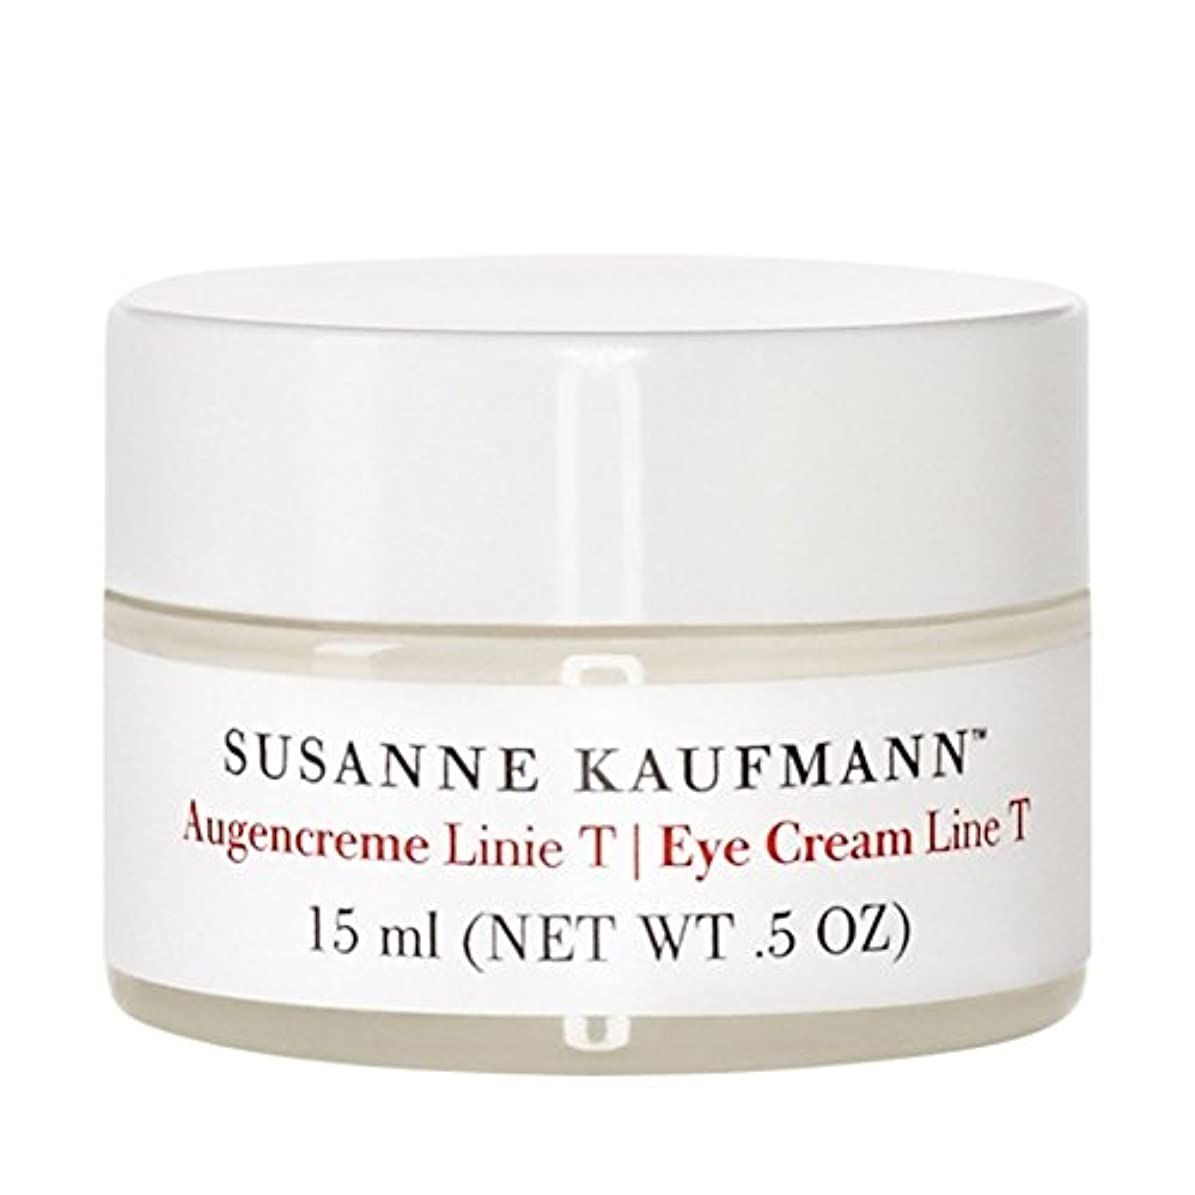 Susanne Kaufmann Eye Cream Line T 15ml (Pack of 6) - スザンヌカウフマンアイクリームライントンの15ミリリットル x6 [並行輸入品]